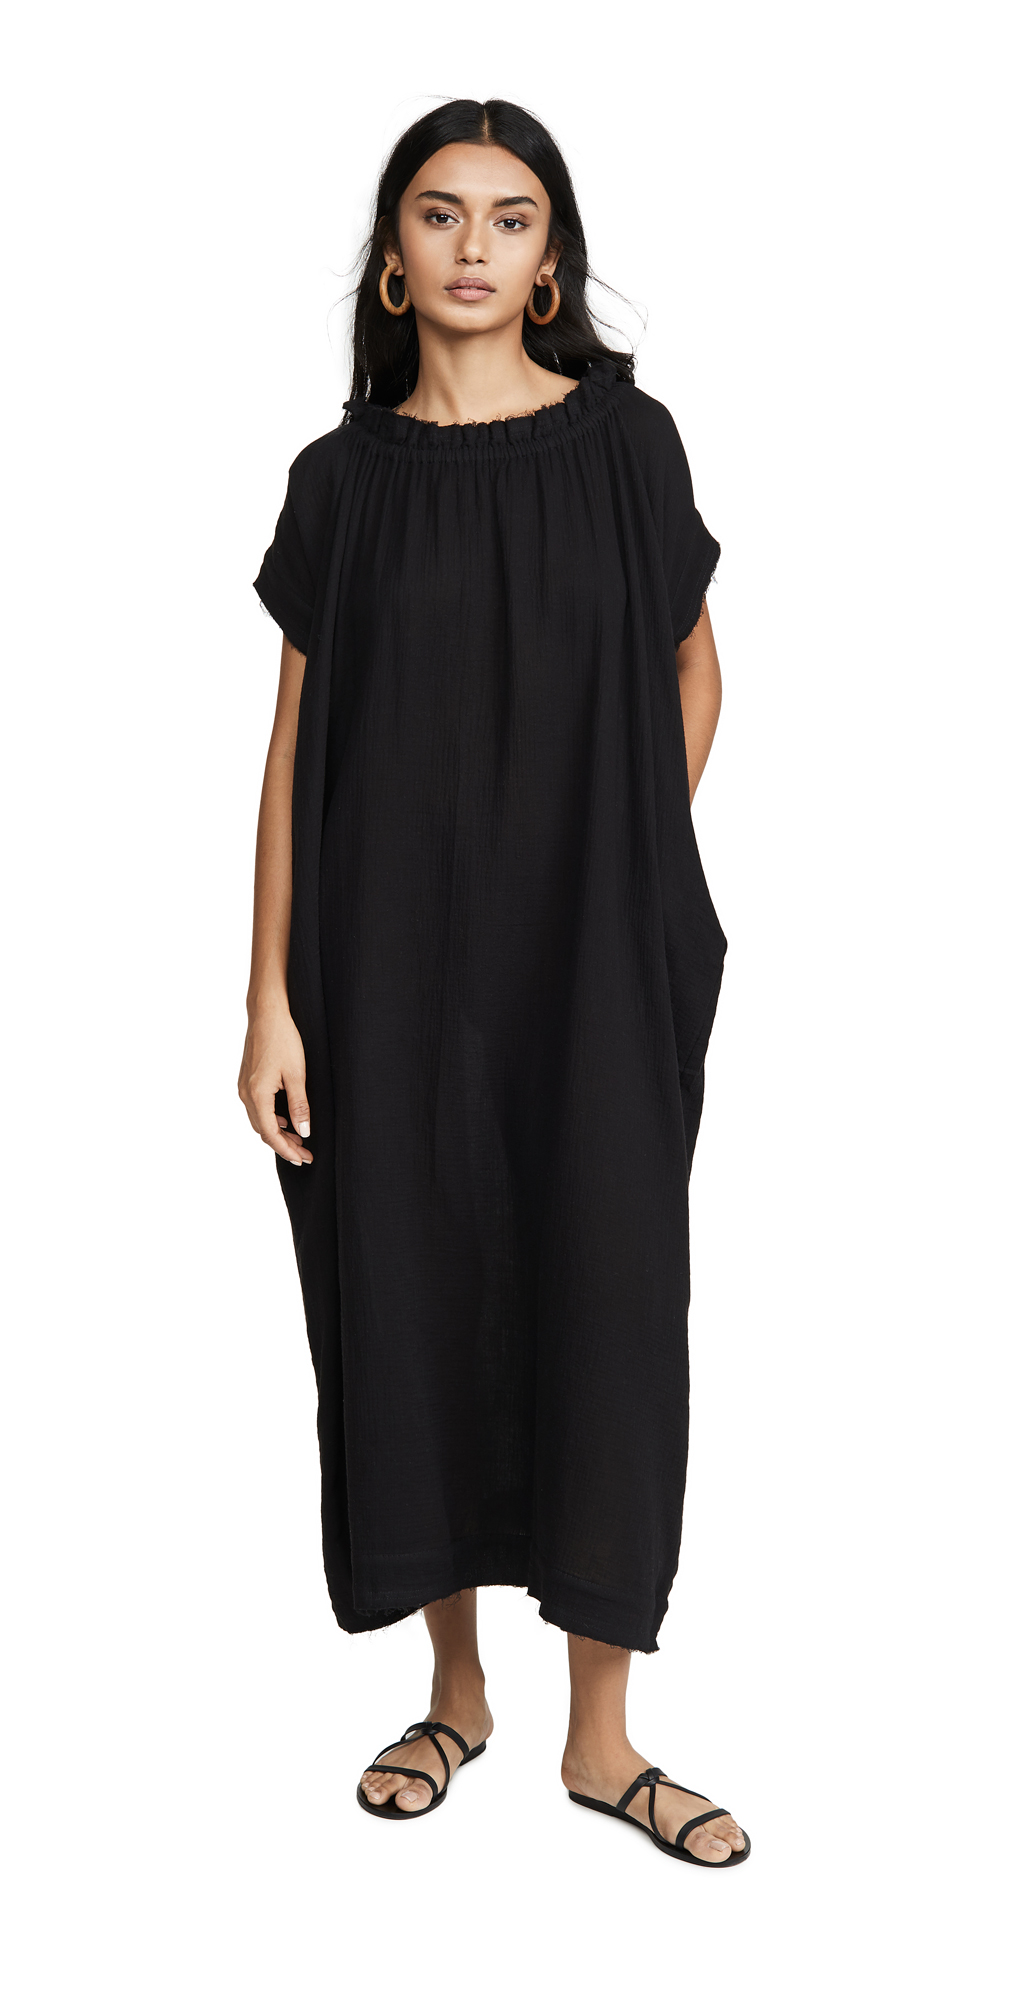 Mirakami Dress